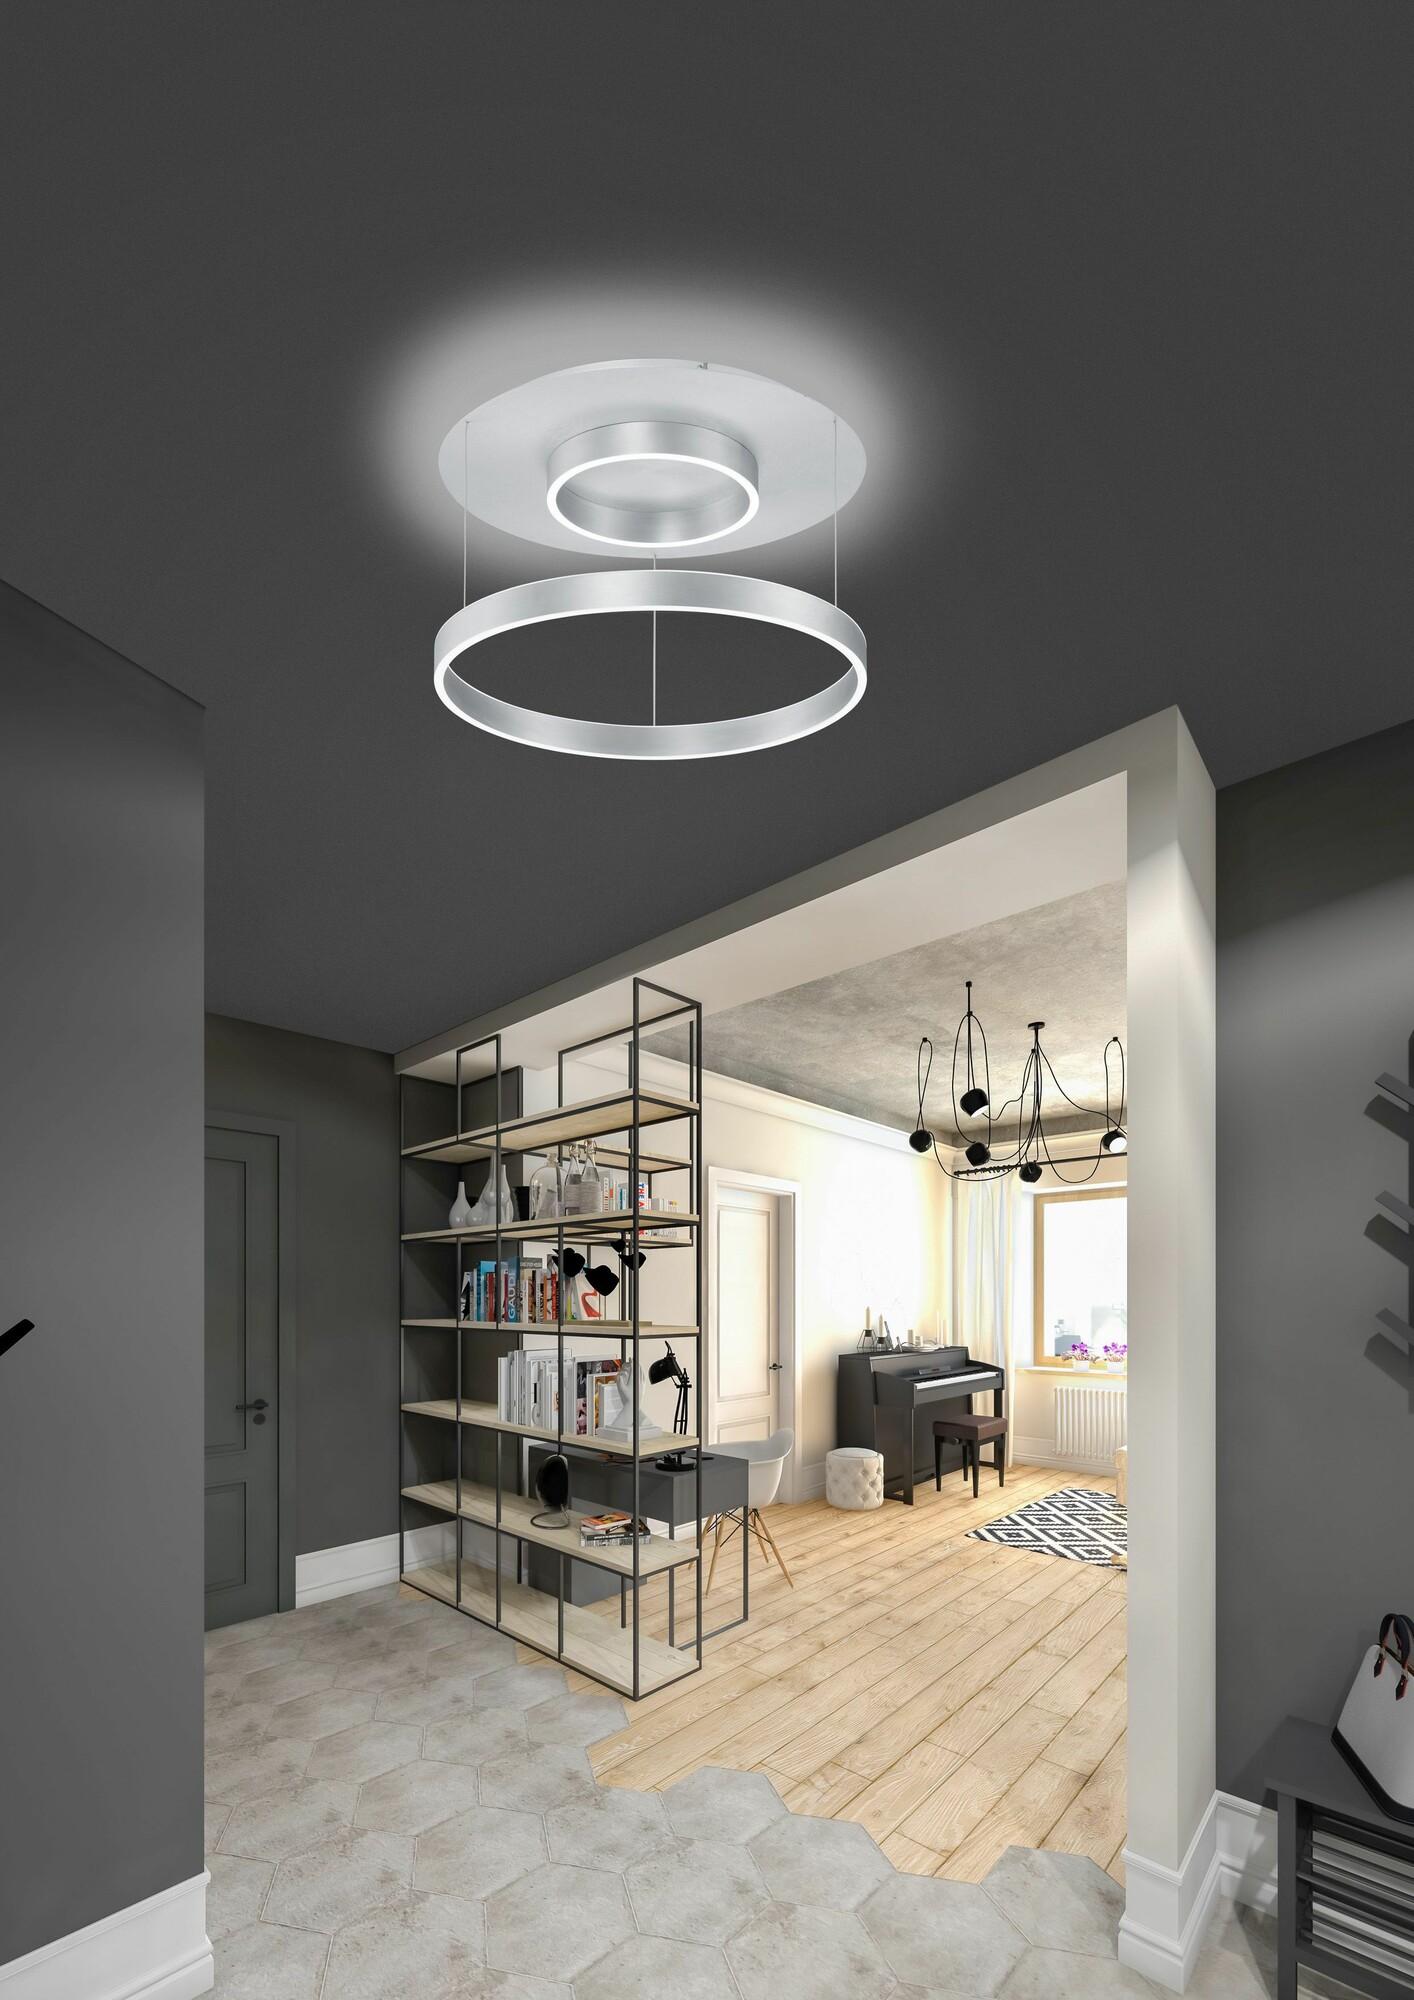 TELDA Plafondlamp LED 1x80W/7500lm Zilver